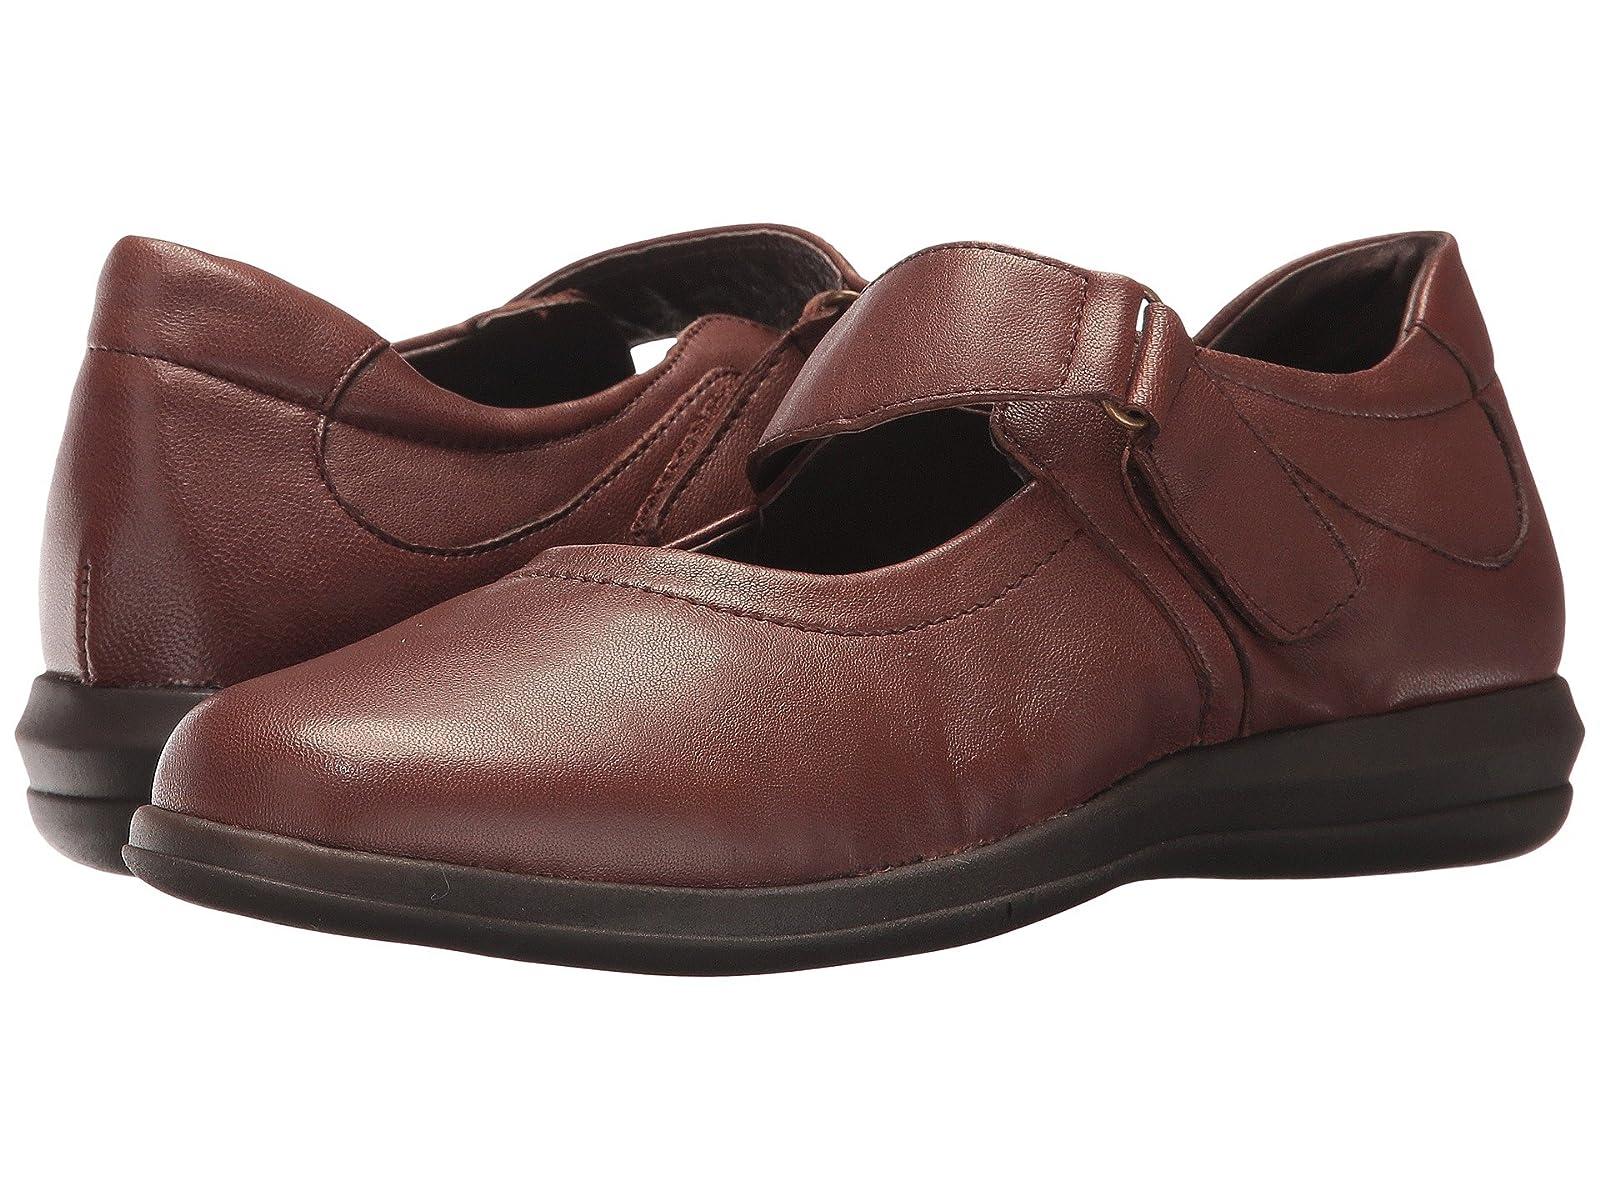 David Tate BajaCheap and distinctive eye-catching shoes